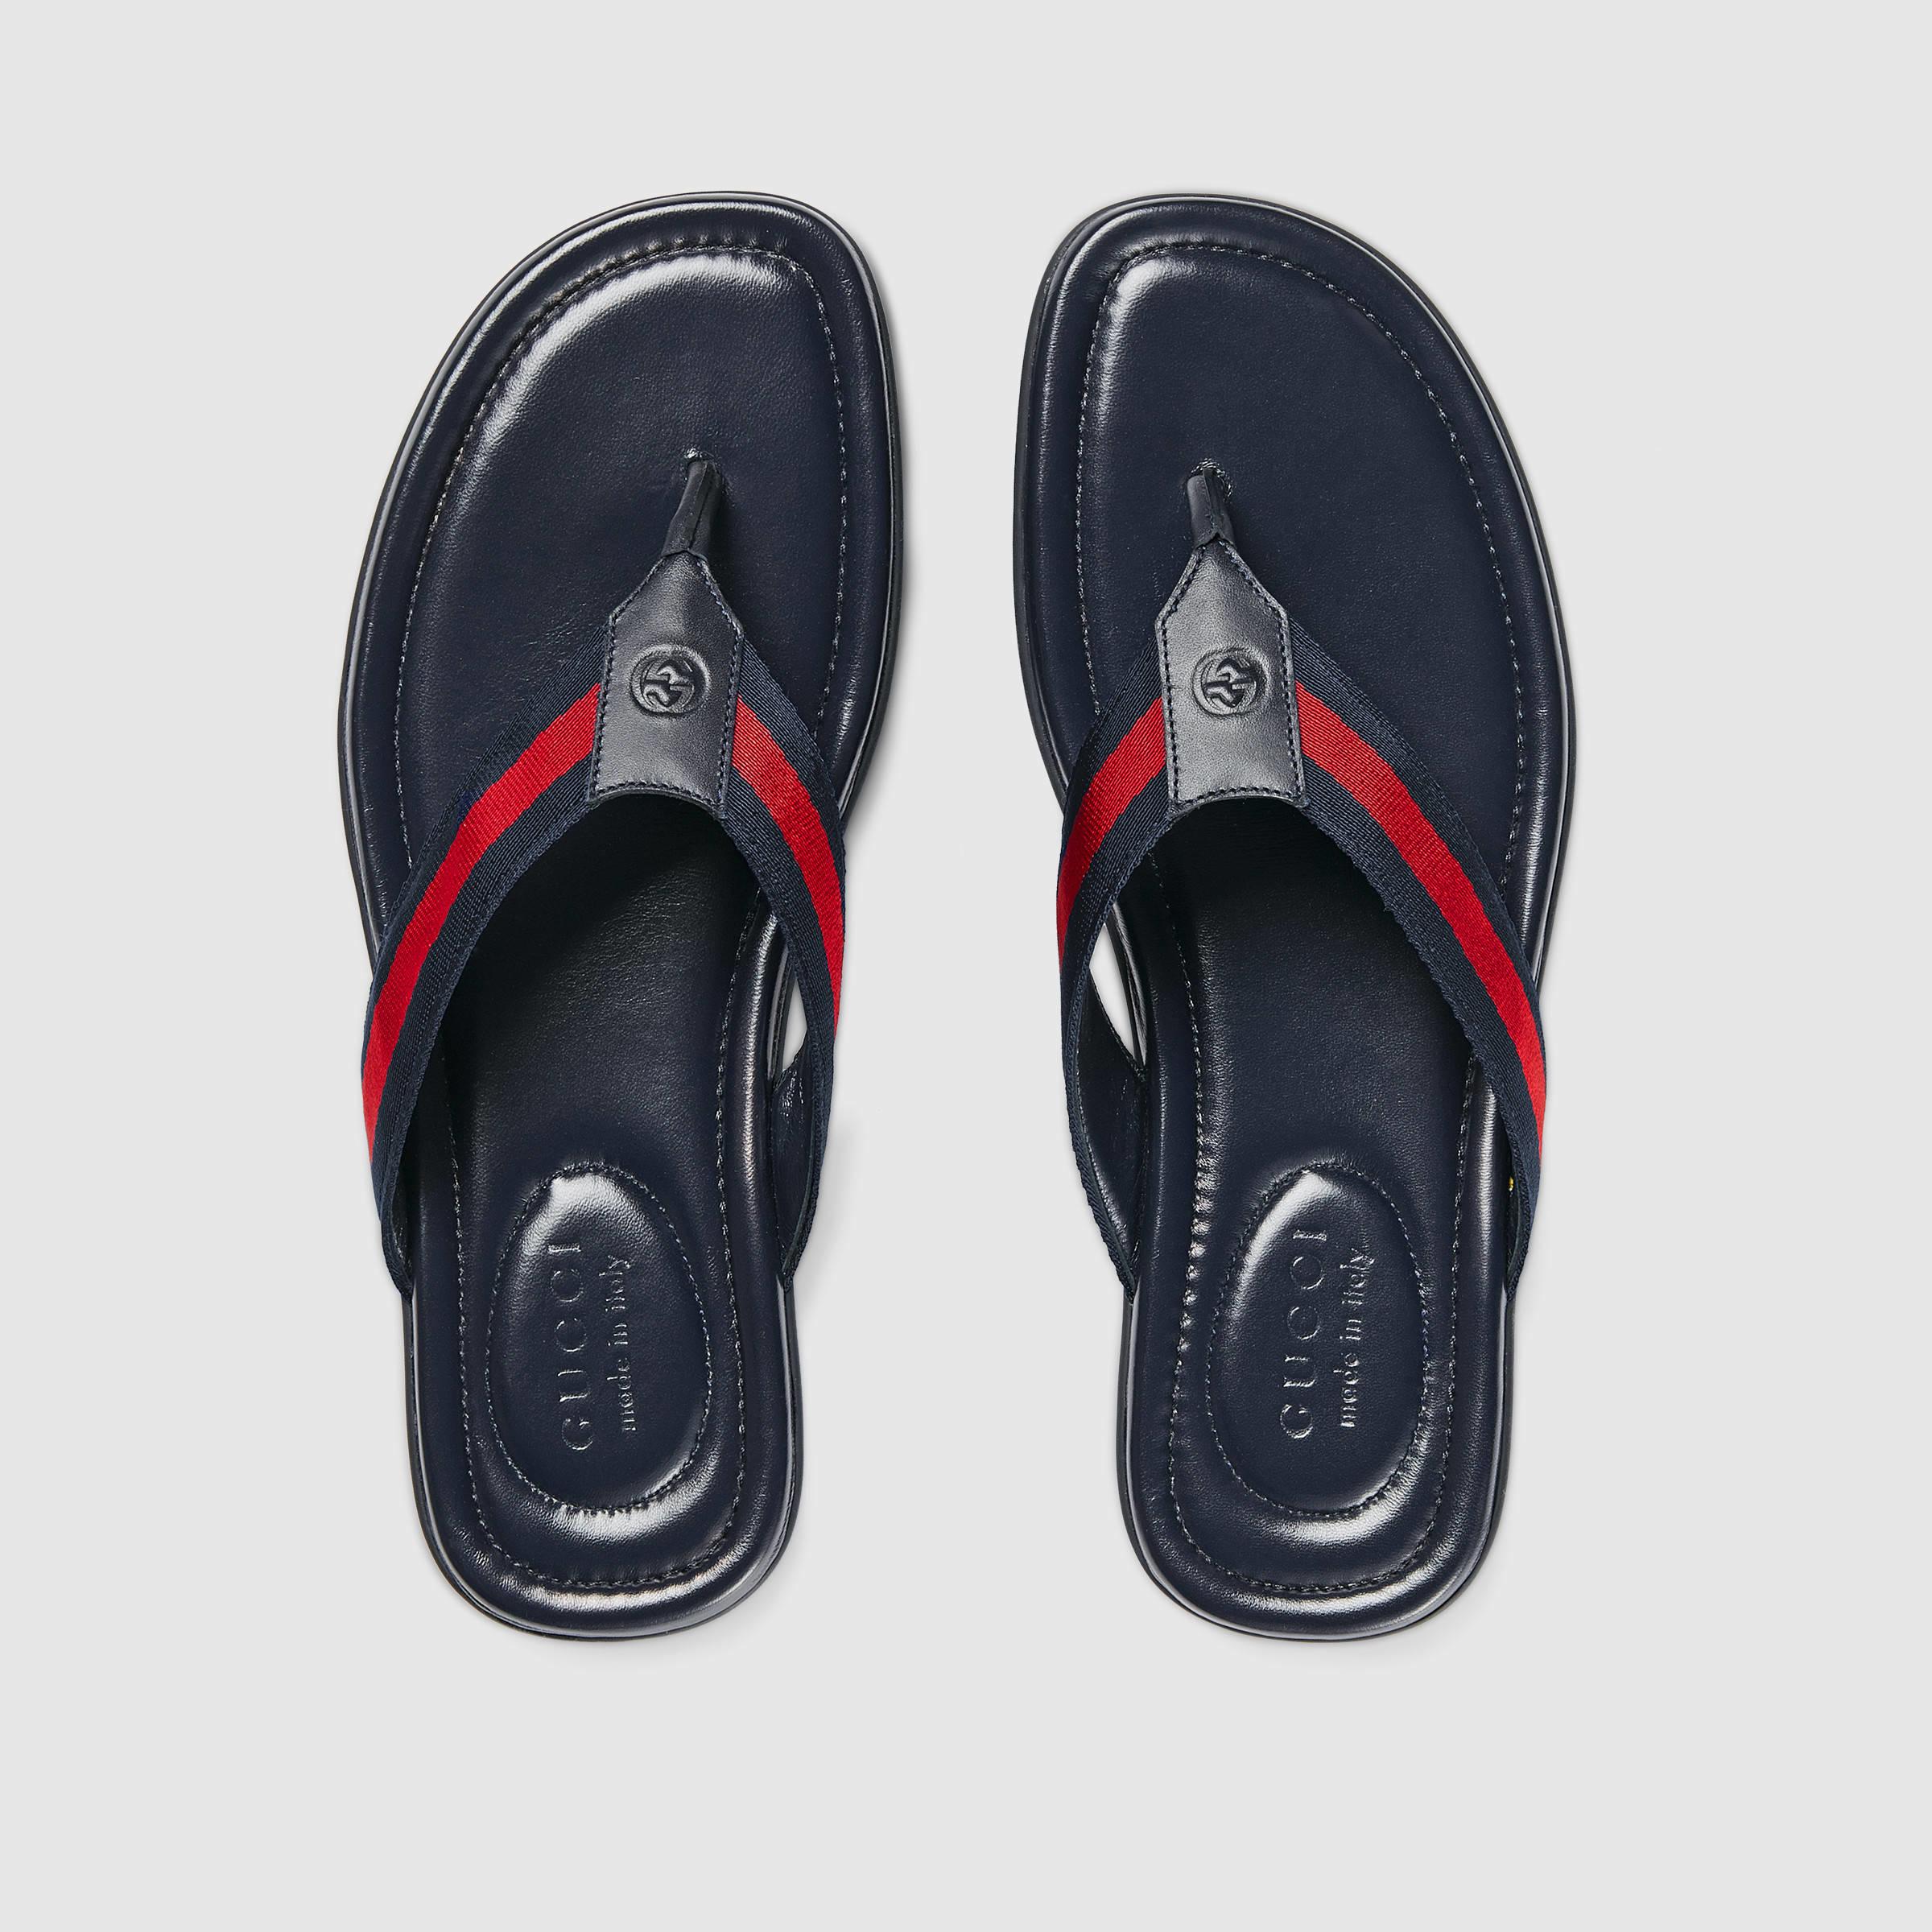 helpful comfort katavi in image us bungee m teva athletic men reviews nike best thong outdoor sandal cord sandals s slides comforter pcr rated product